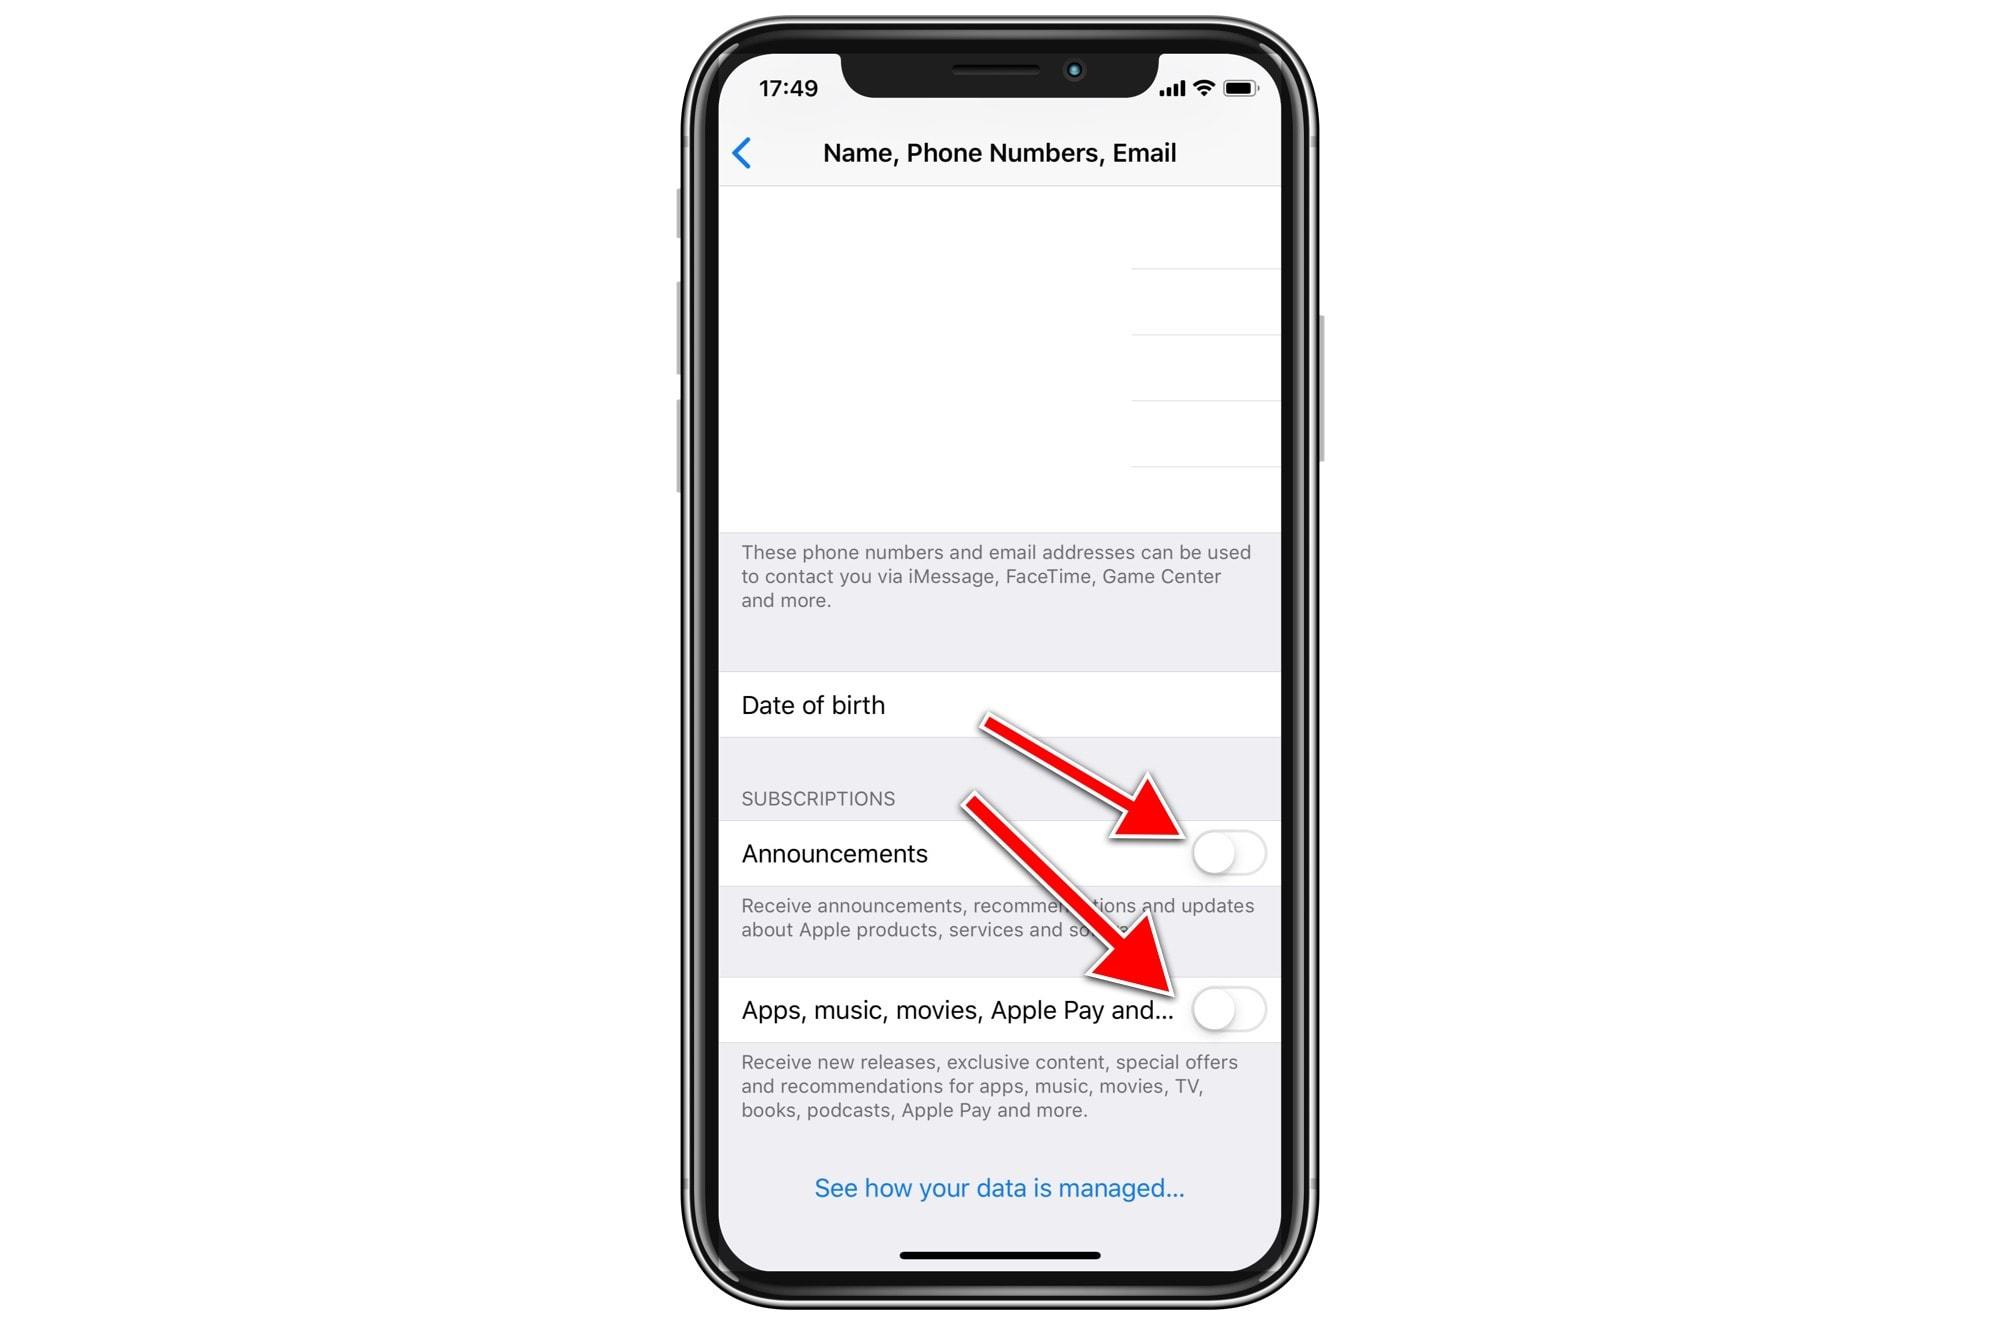 Apple promo emails: Despic-apple.